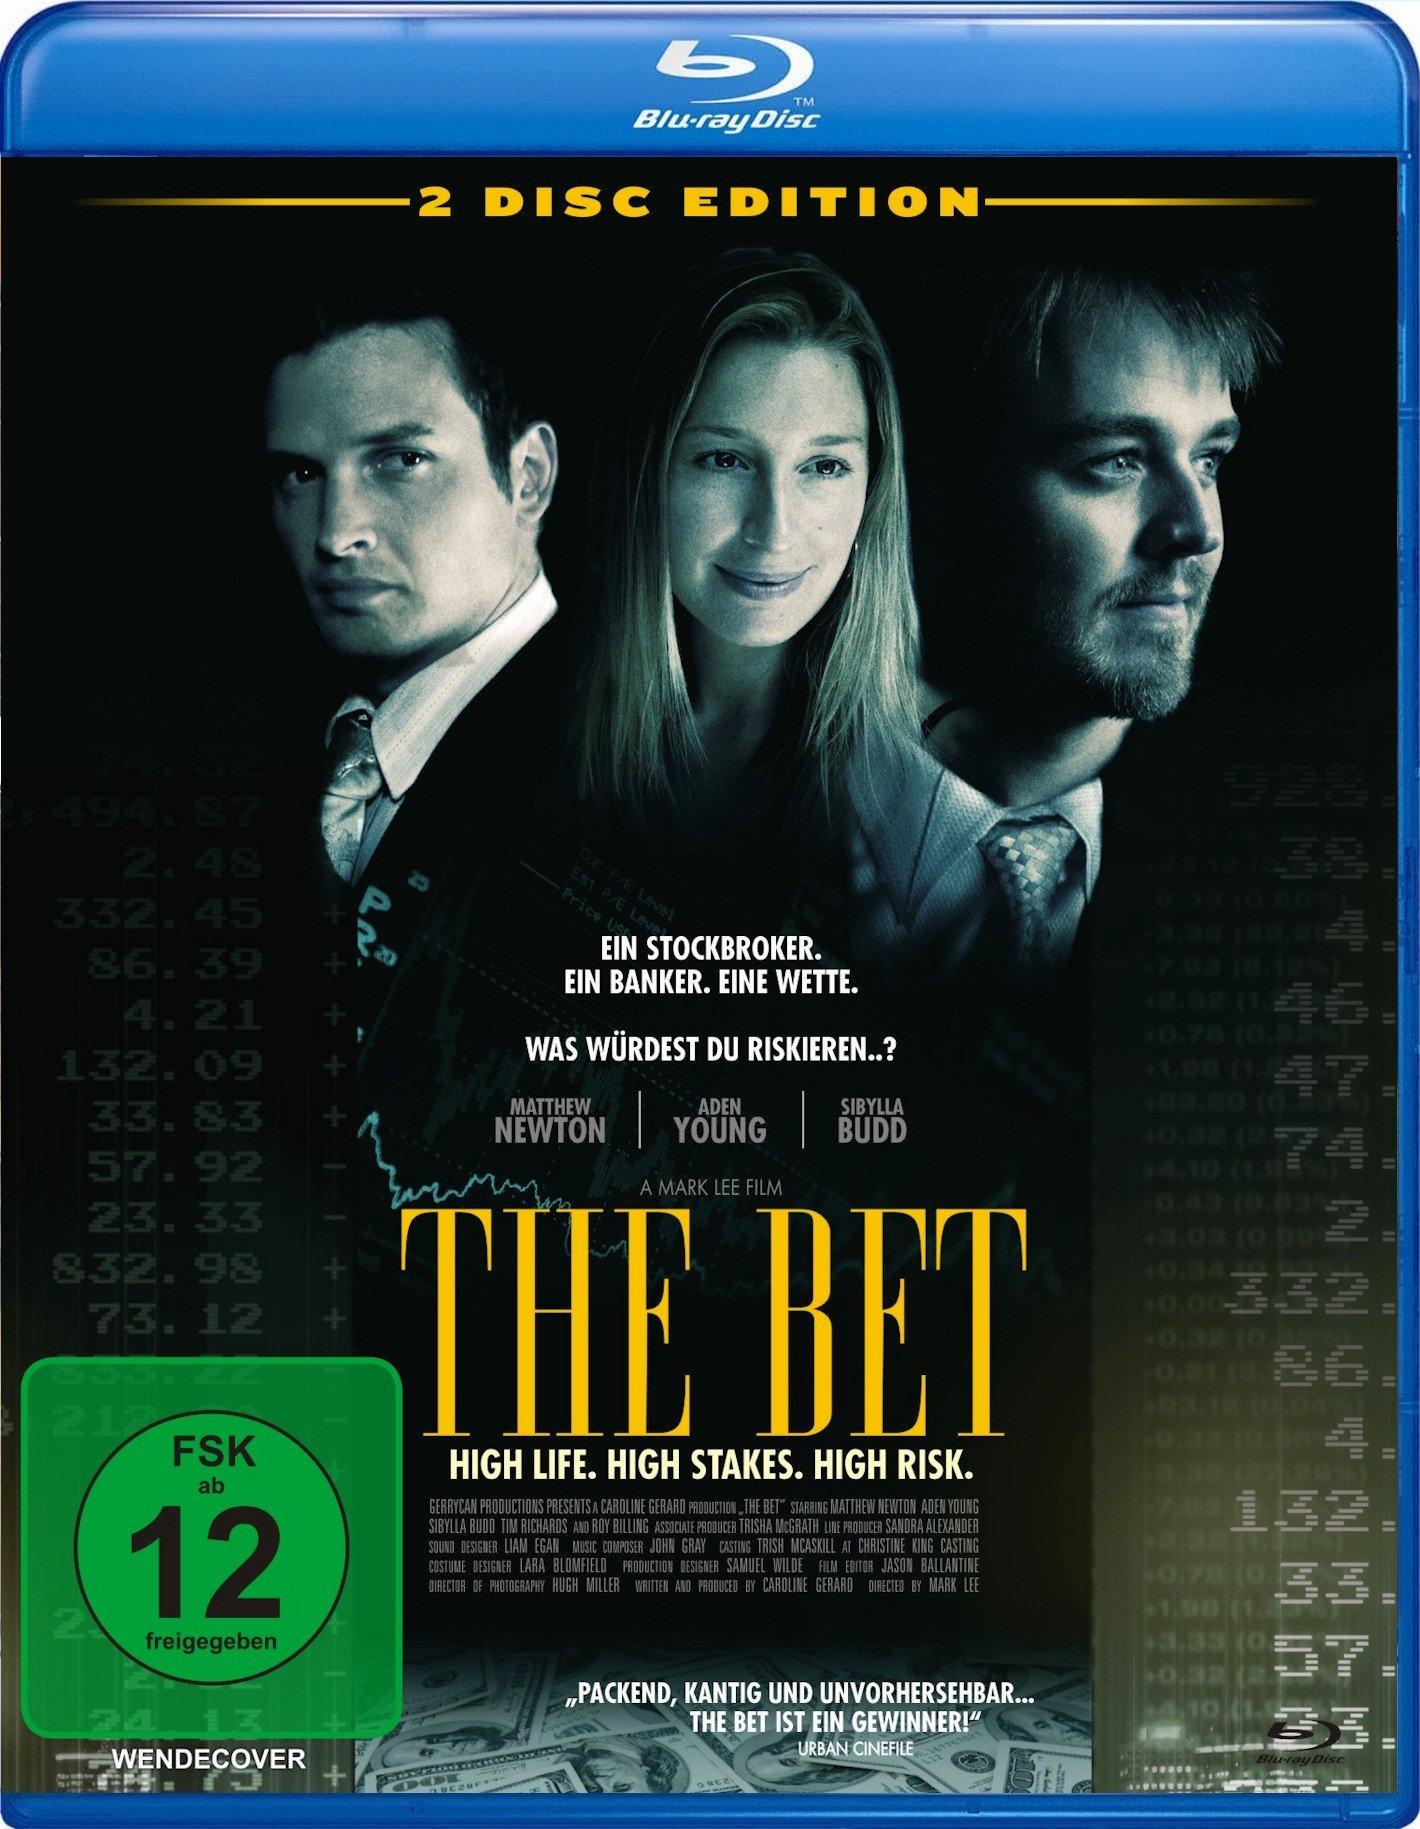 download The.Bet.German.2006.AC3.BDRip.x264.iNTERNAL-EXPS